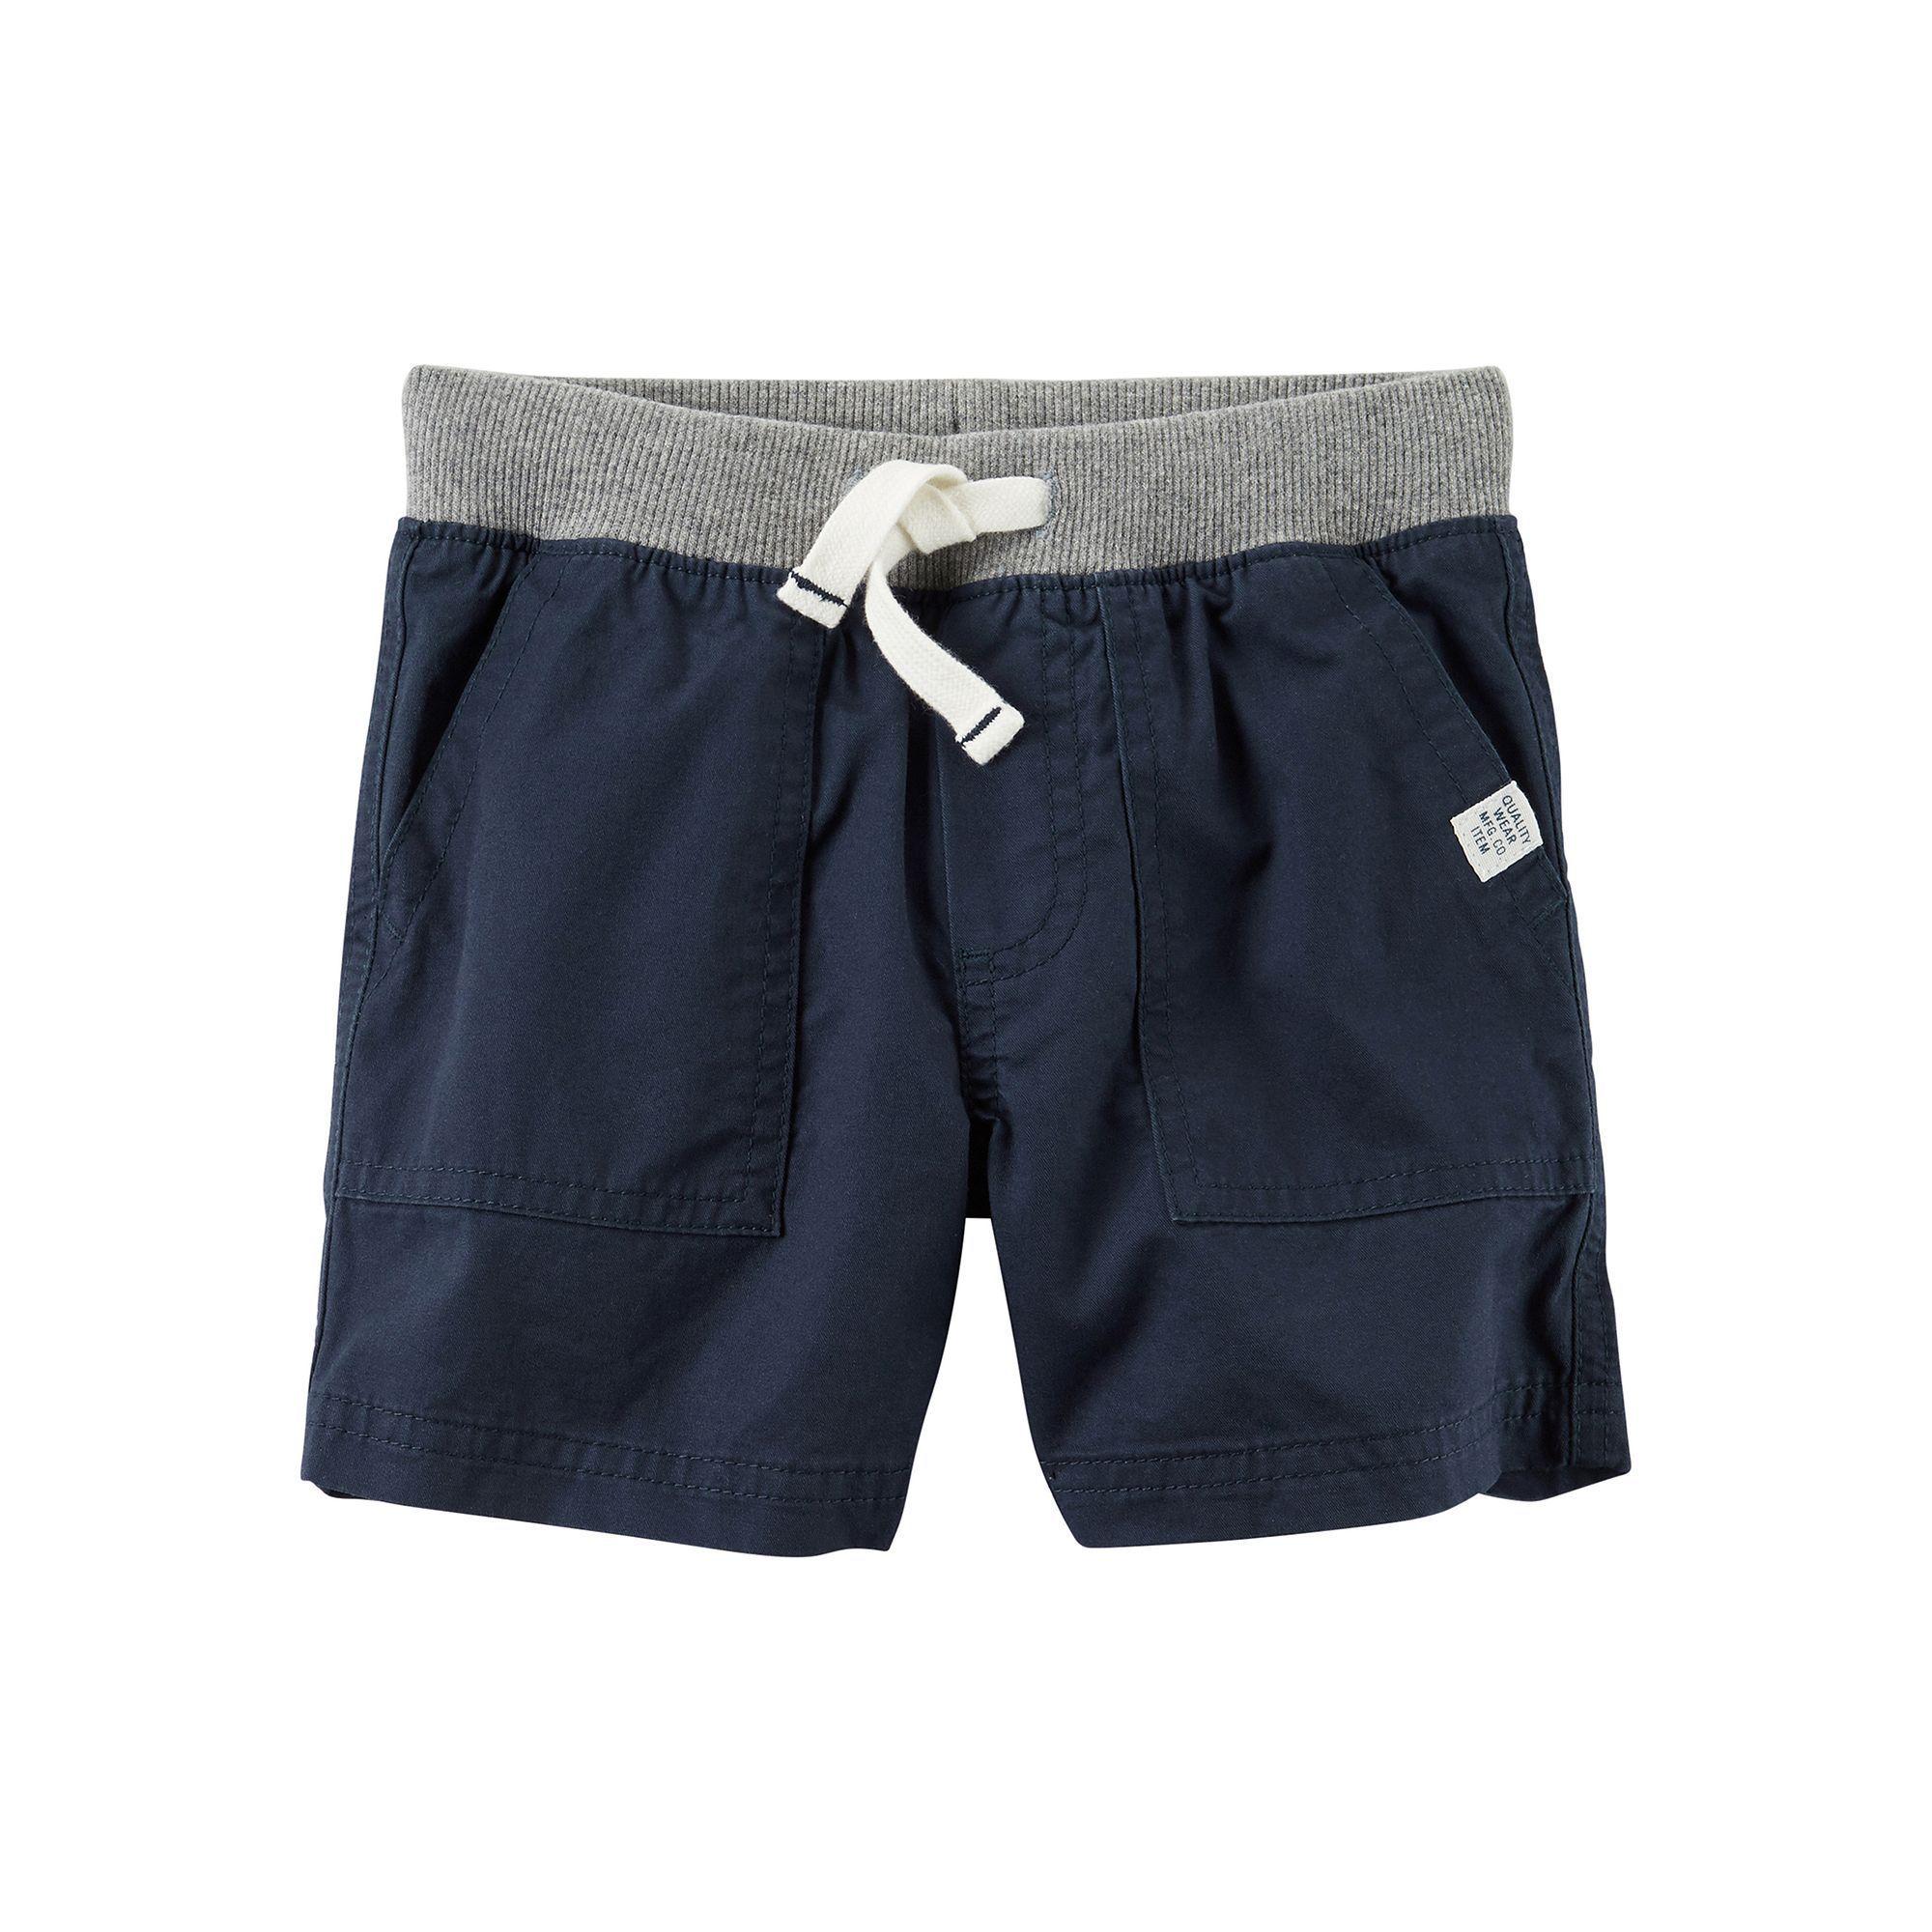 Toddler Boy Carter's Khaki Shorts, Blue | Products | Pinterest ...